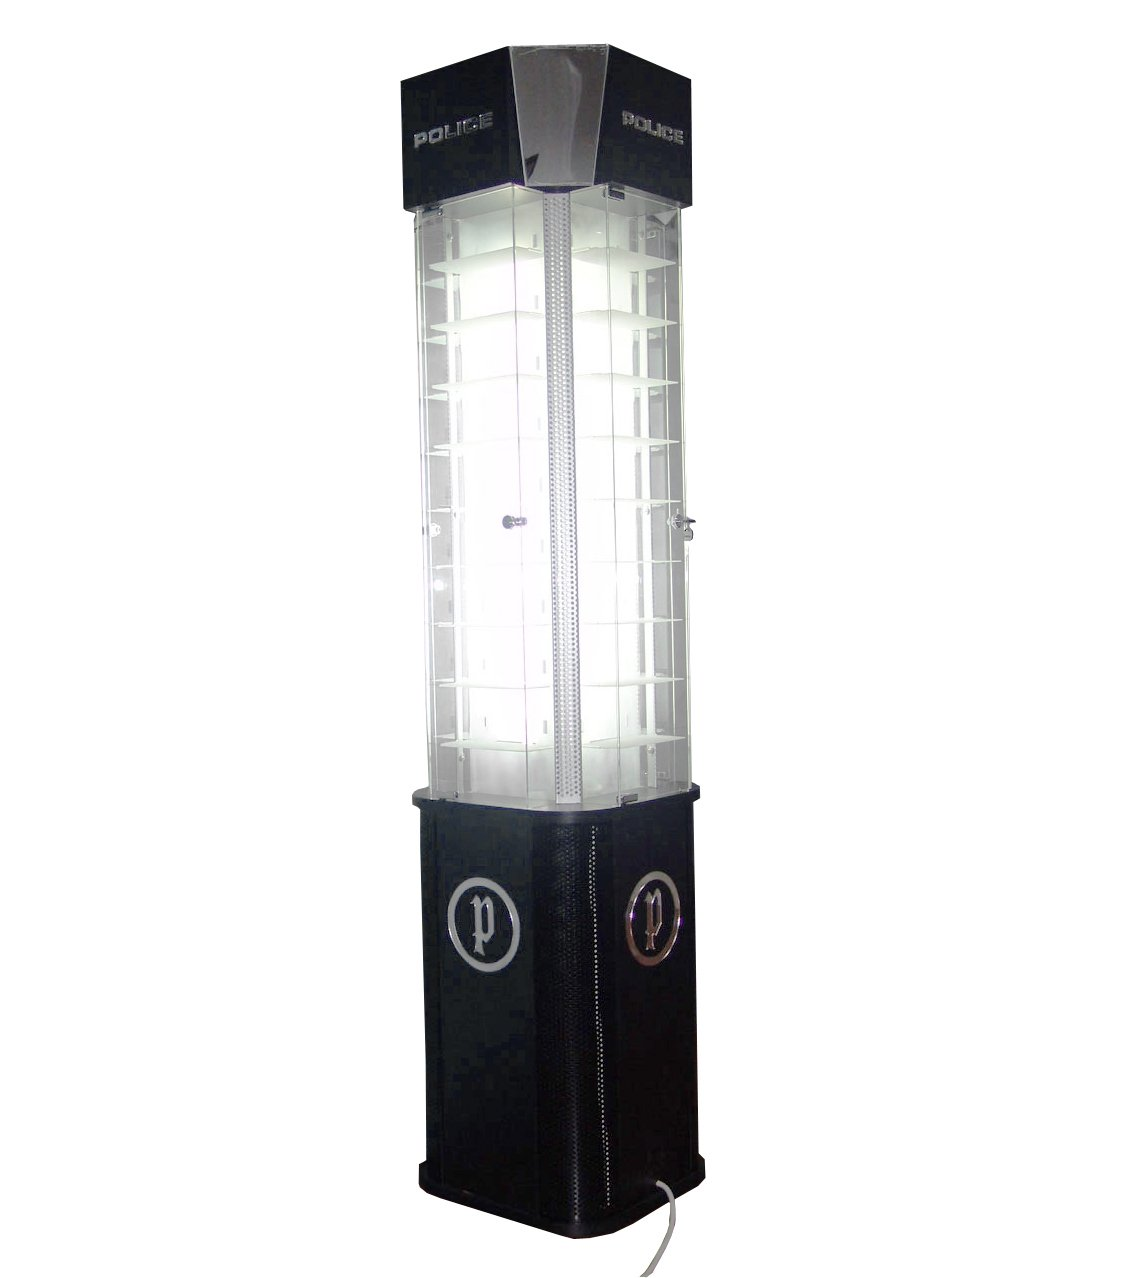 FixtureDisplays Deluxe Eyeglass Display w/ Mirrors & Lights Illuminating, Floor Standing, Holds 36 Pairs - Black 2397-NPF